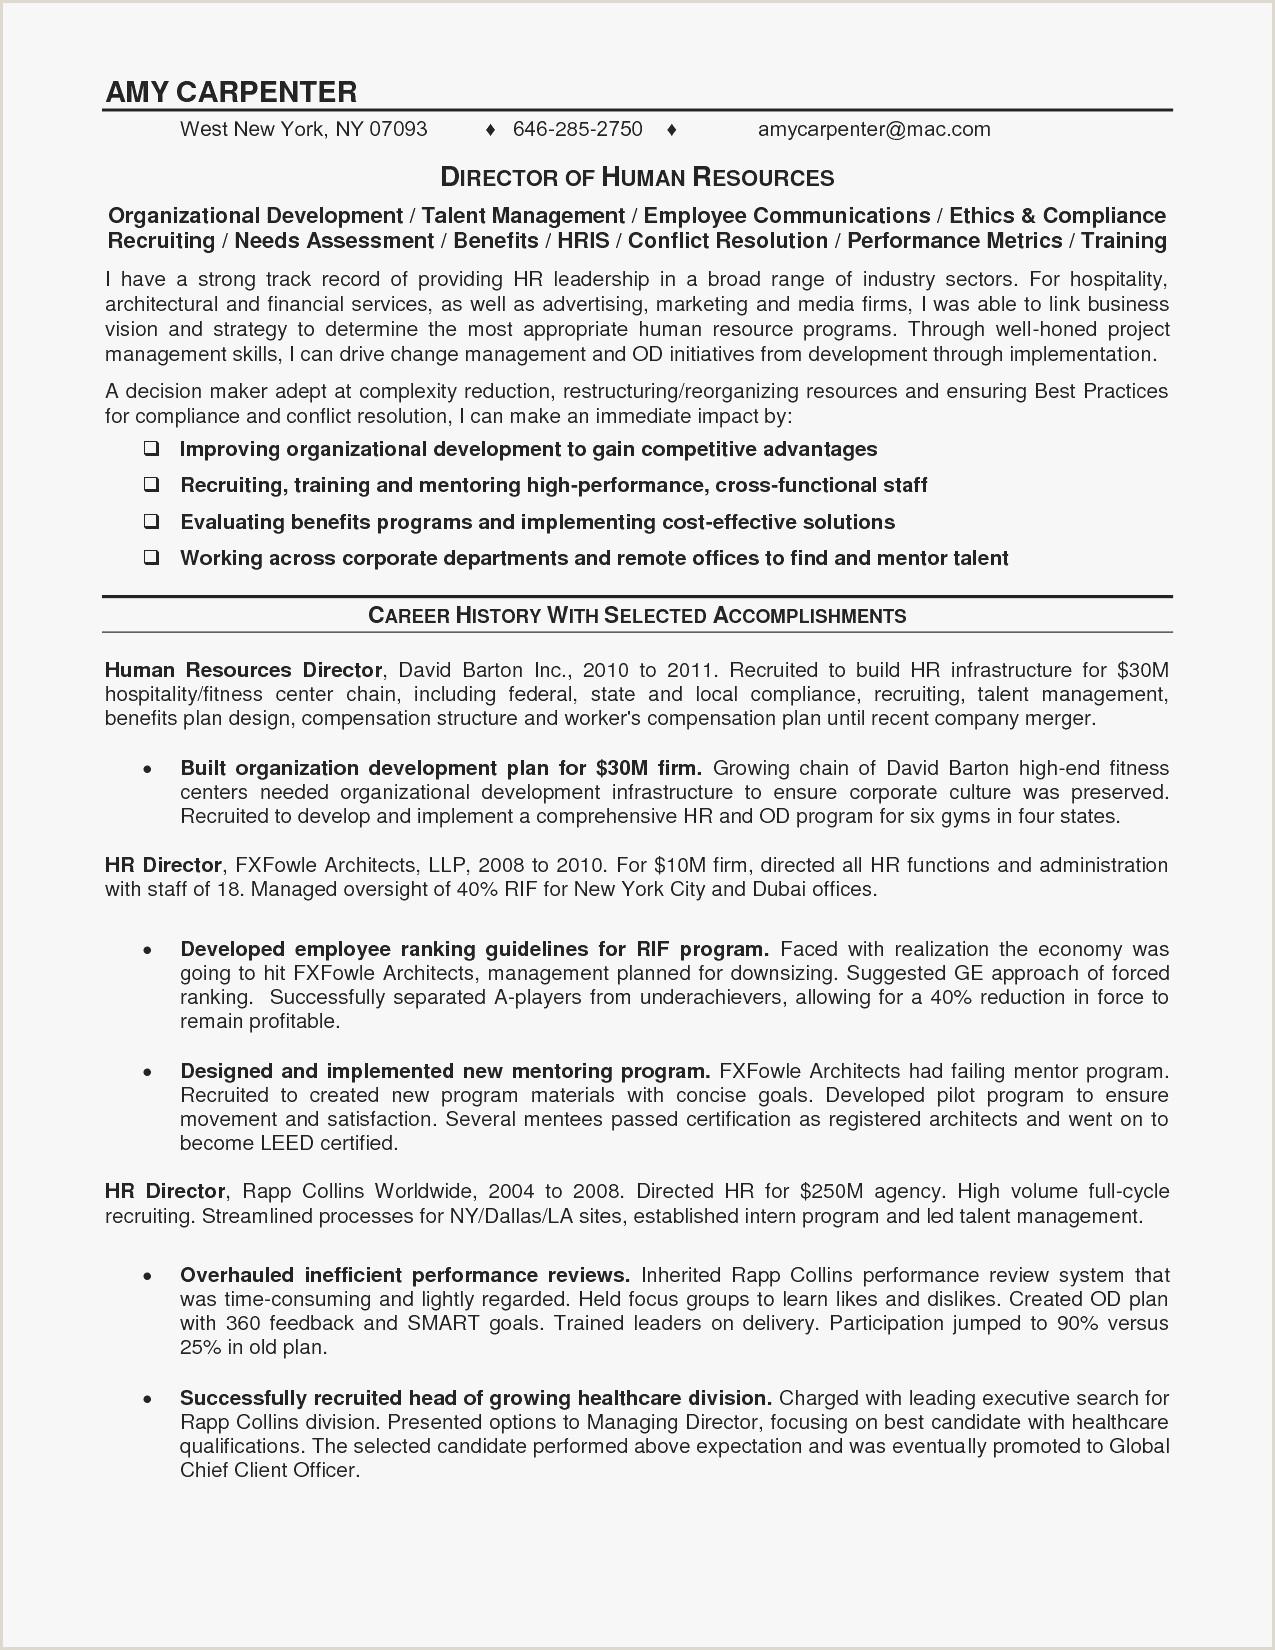 Sample Resume For Hotel And Restaurant Management Ojt New